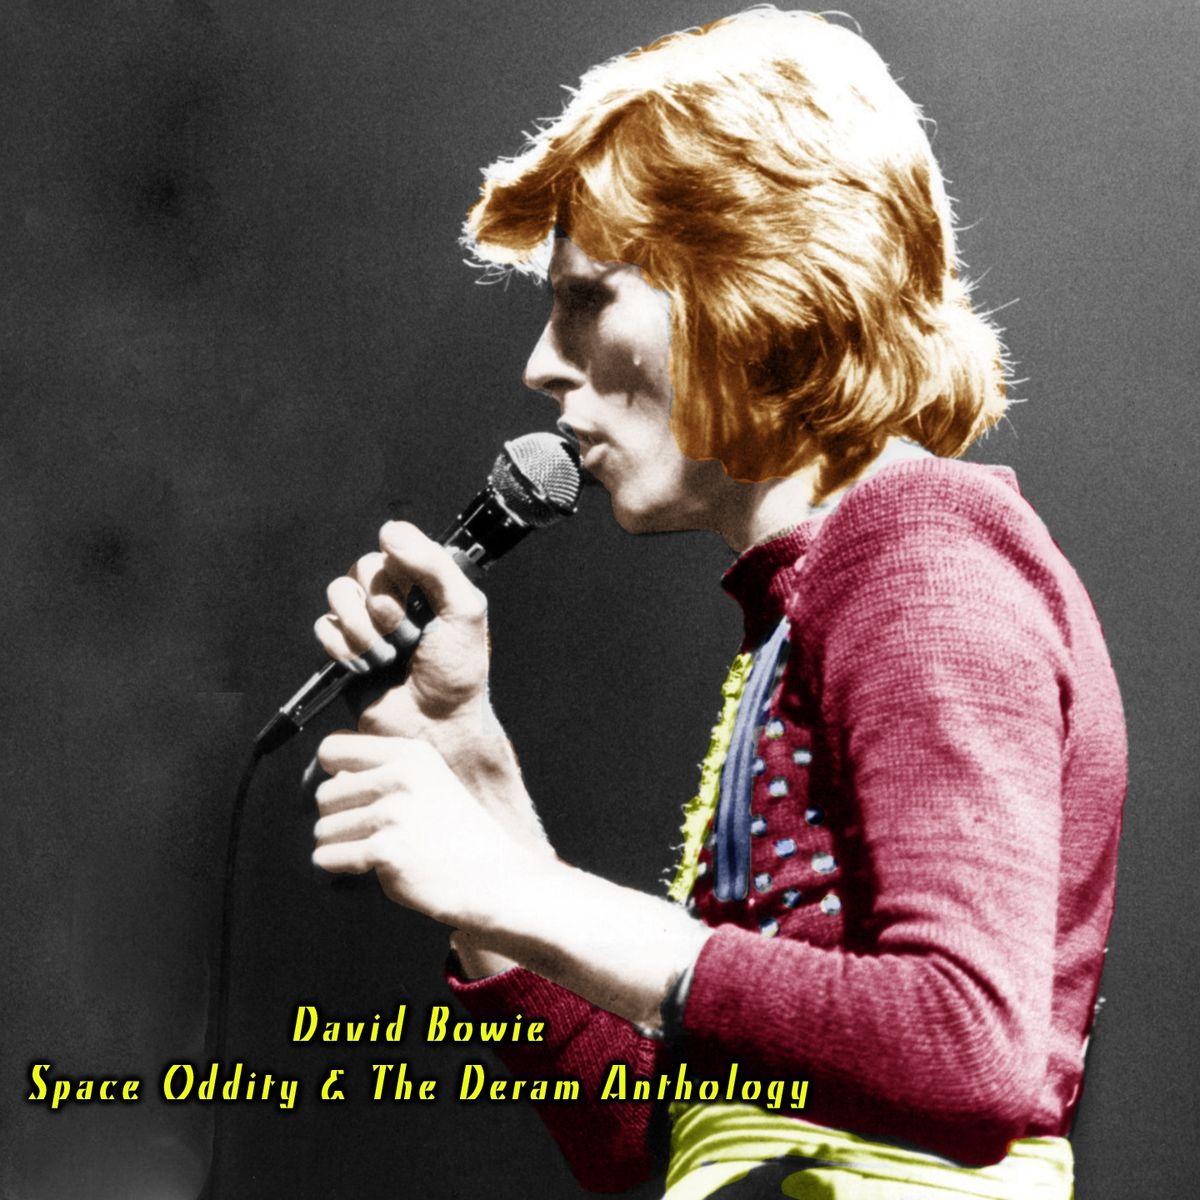 Download David Bowie Space Oddity The Deram Anthology 2019